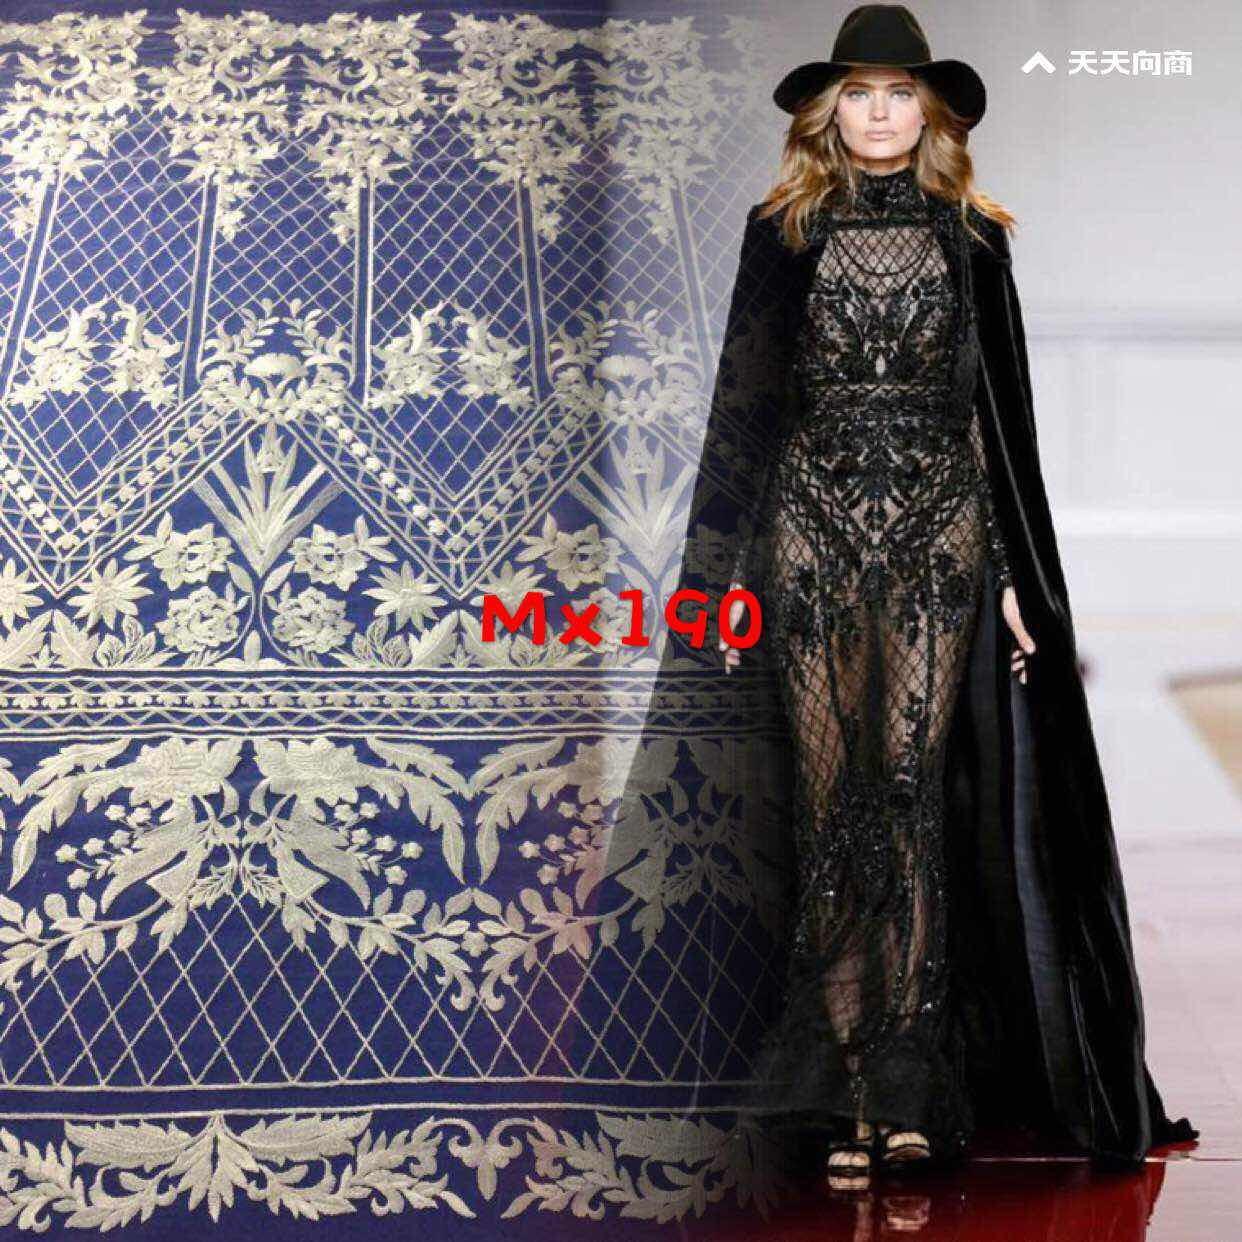 China Hot Sale Geometry Lace Fashion Design Popular Bride Dress Beautiful Embroidery Lace Fabric China 3d Flower Lace Fabric And Wedding Dress Price